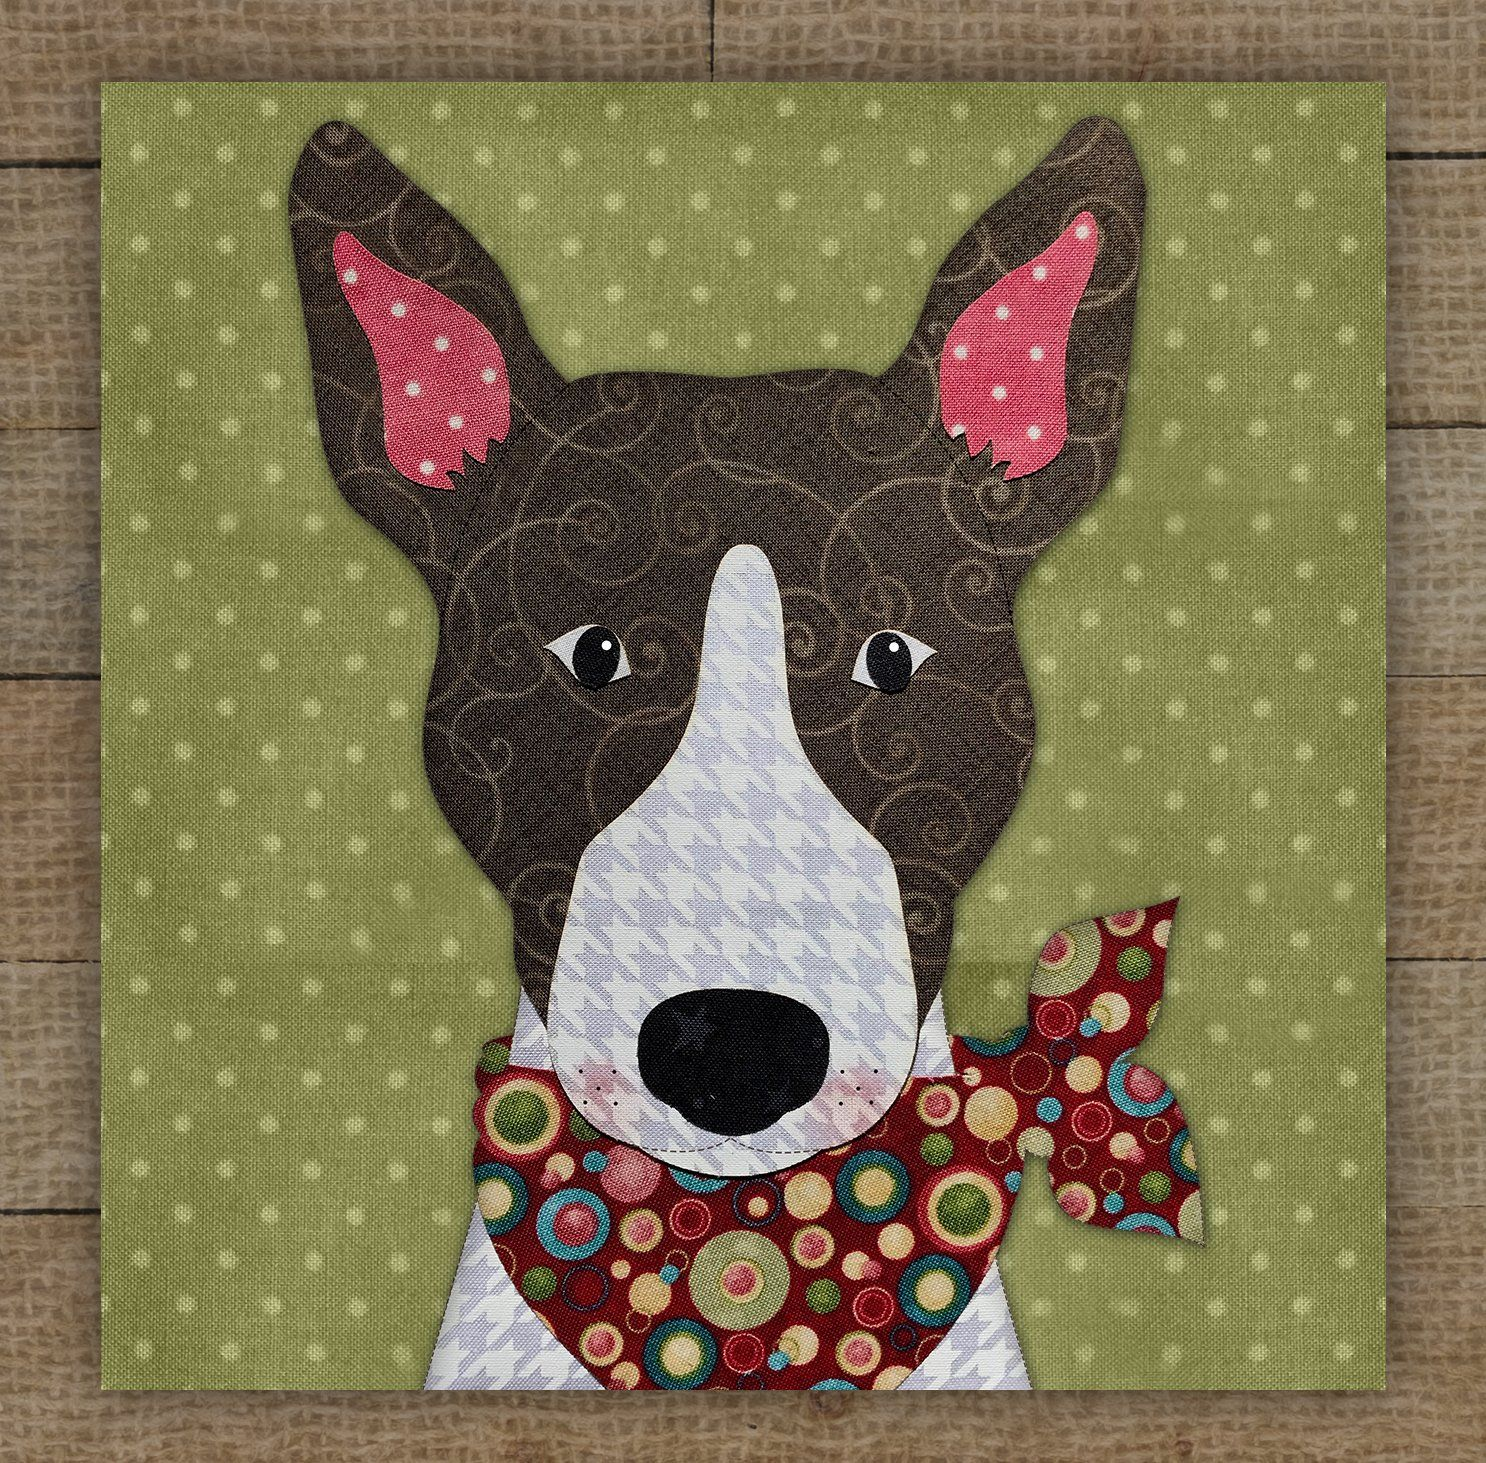 Bull Terrier (Brown) Precut Fused Applique Kit - 6